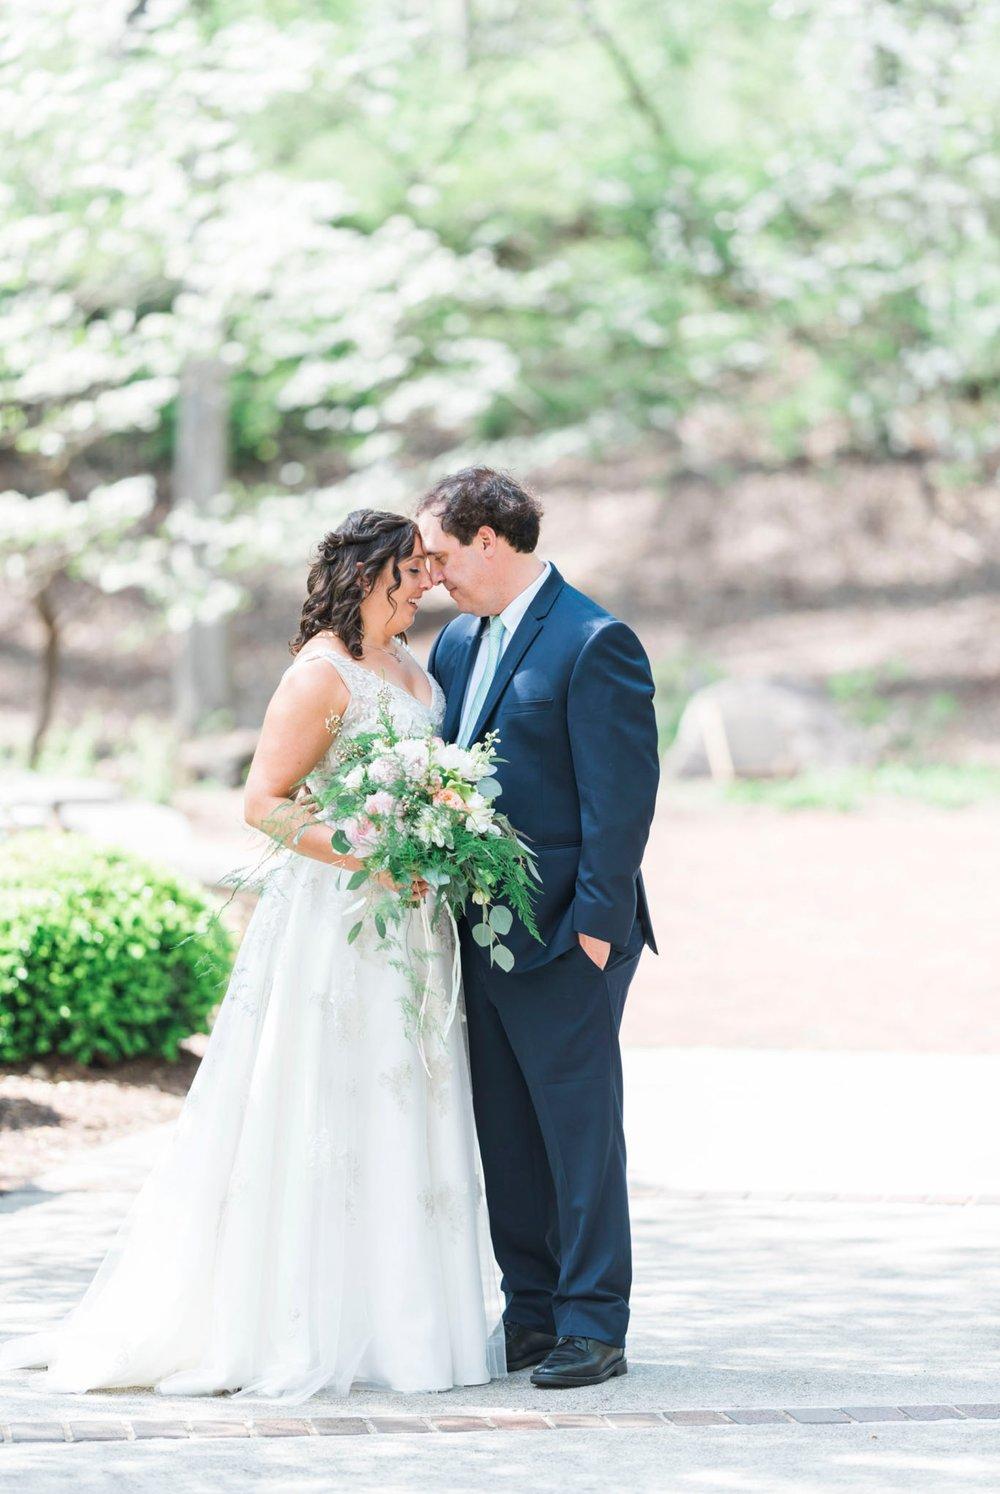 TheVirginianHotel_LynchburgVA_TheVirginianHotelWedding_Virginiaweddingphotographer_Lynchburgvawedding 23.jpg